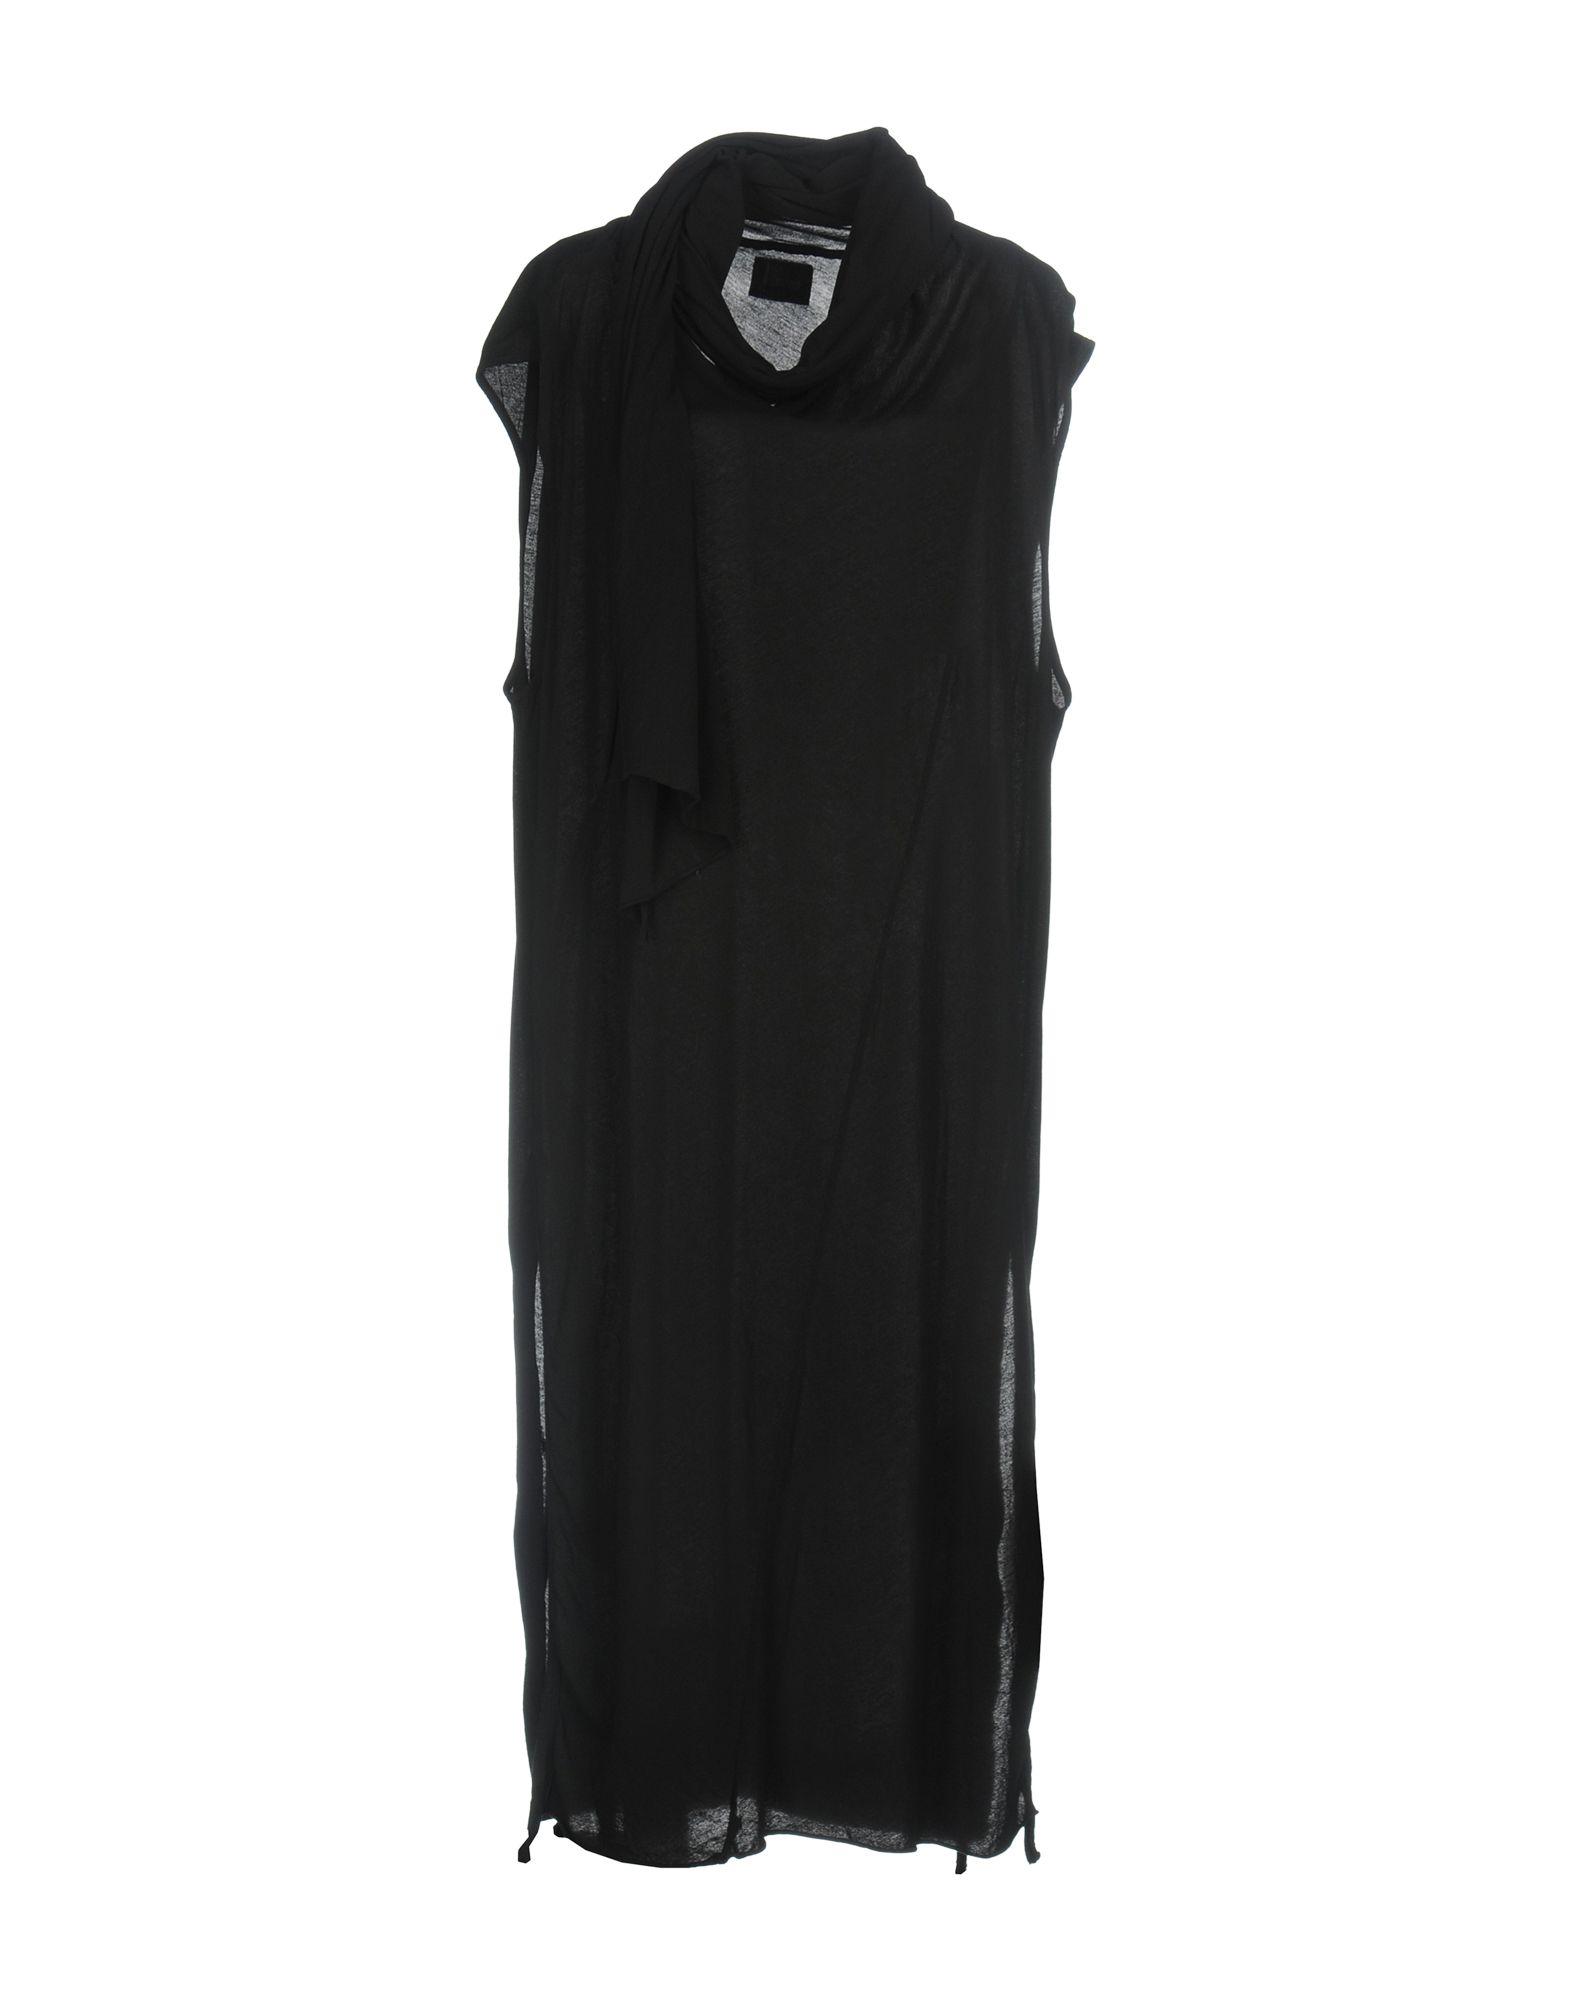 LOST & FOUND Платье длиной 3/4 found in brooklyn